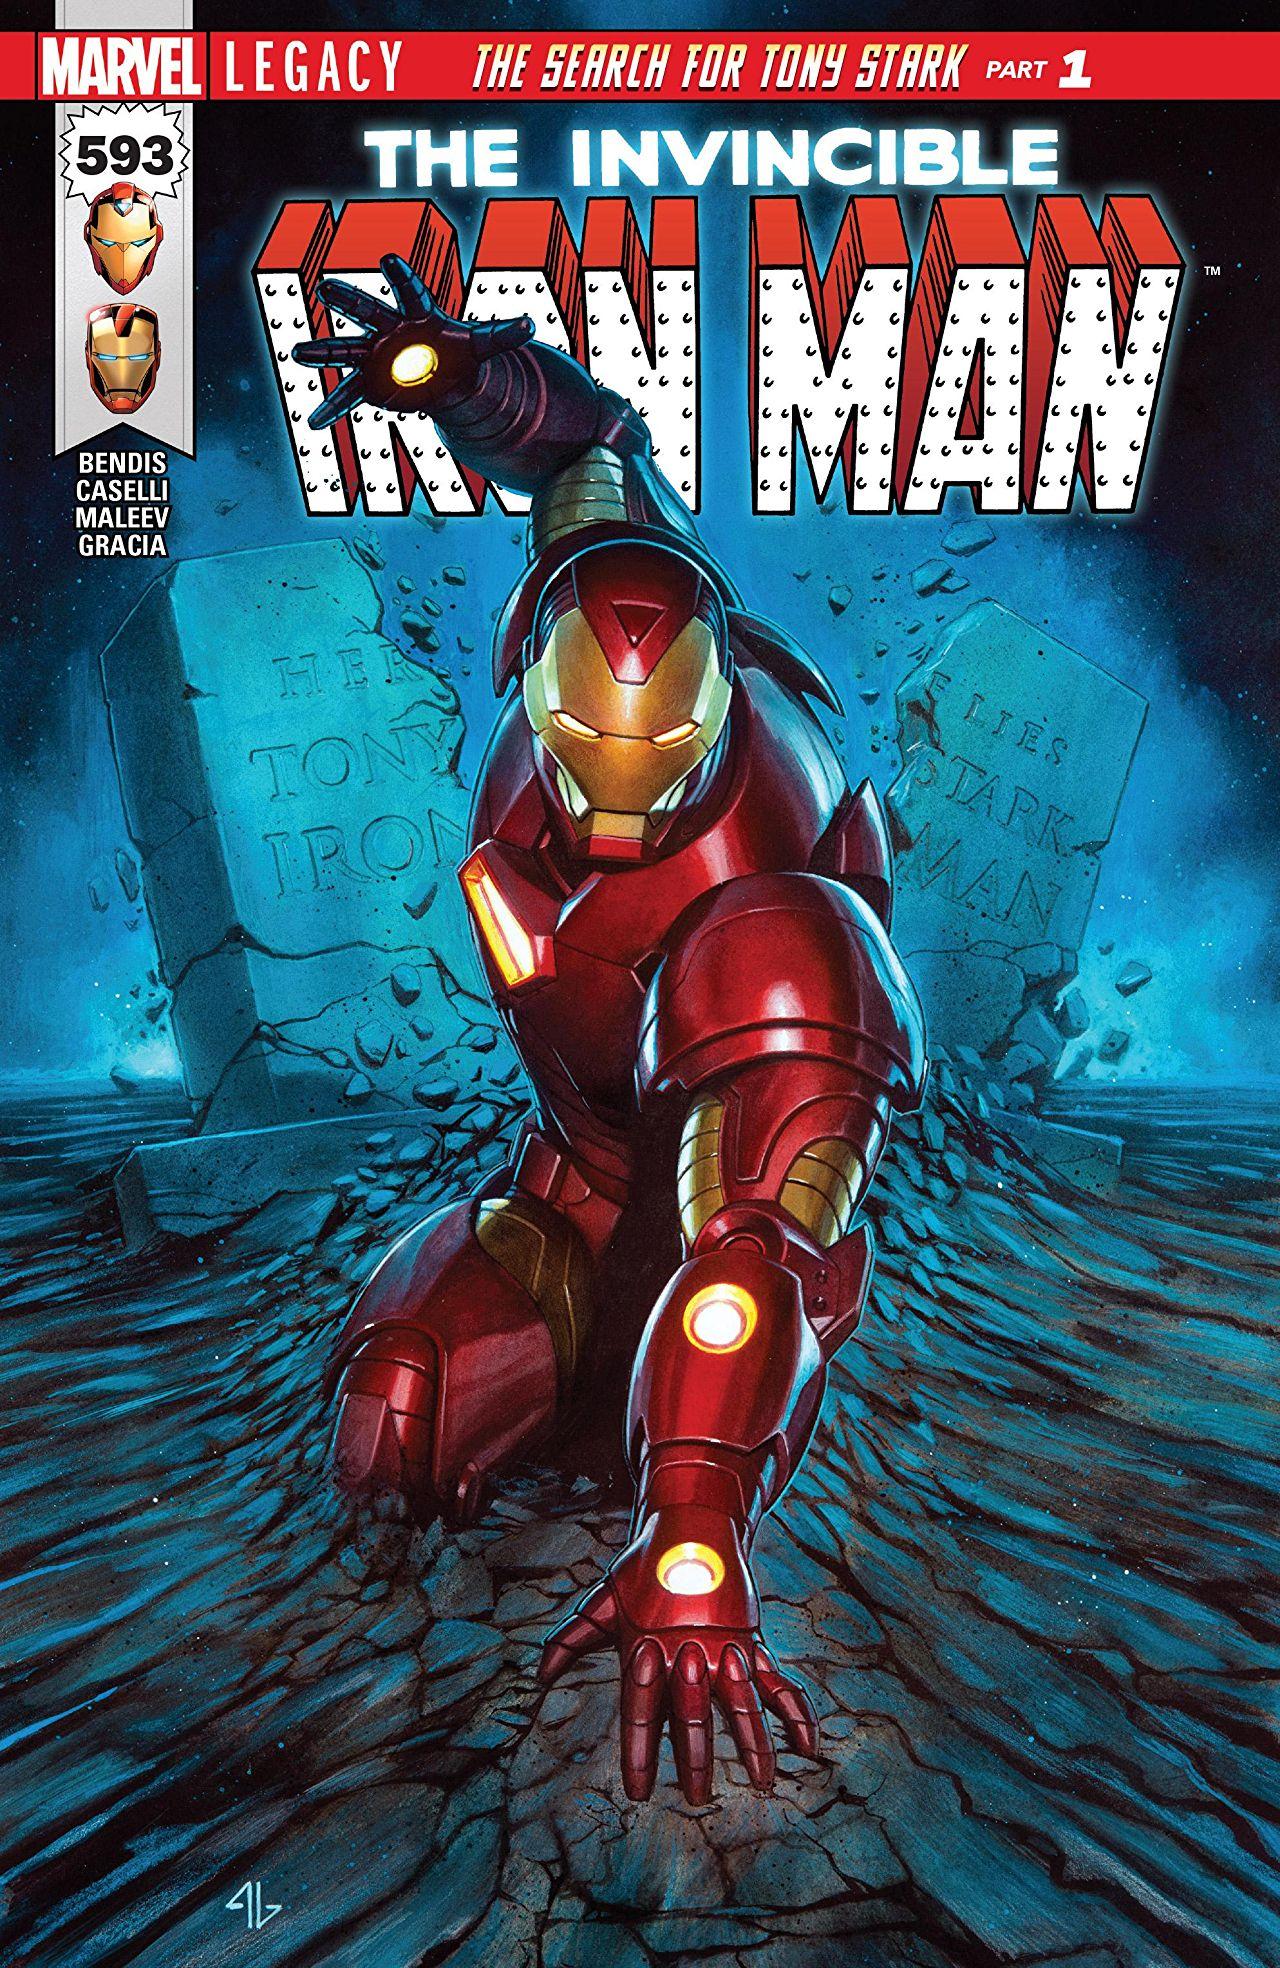 Invincible Iron Man 593 - THE SEARCH FOR TONY STARK